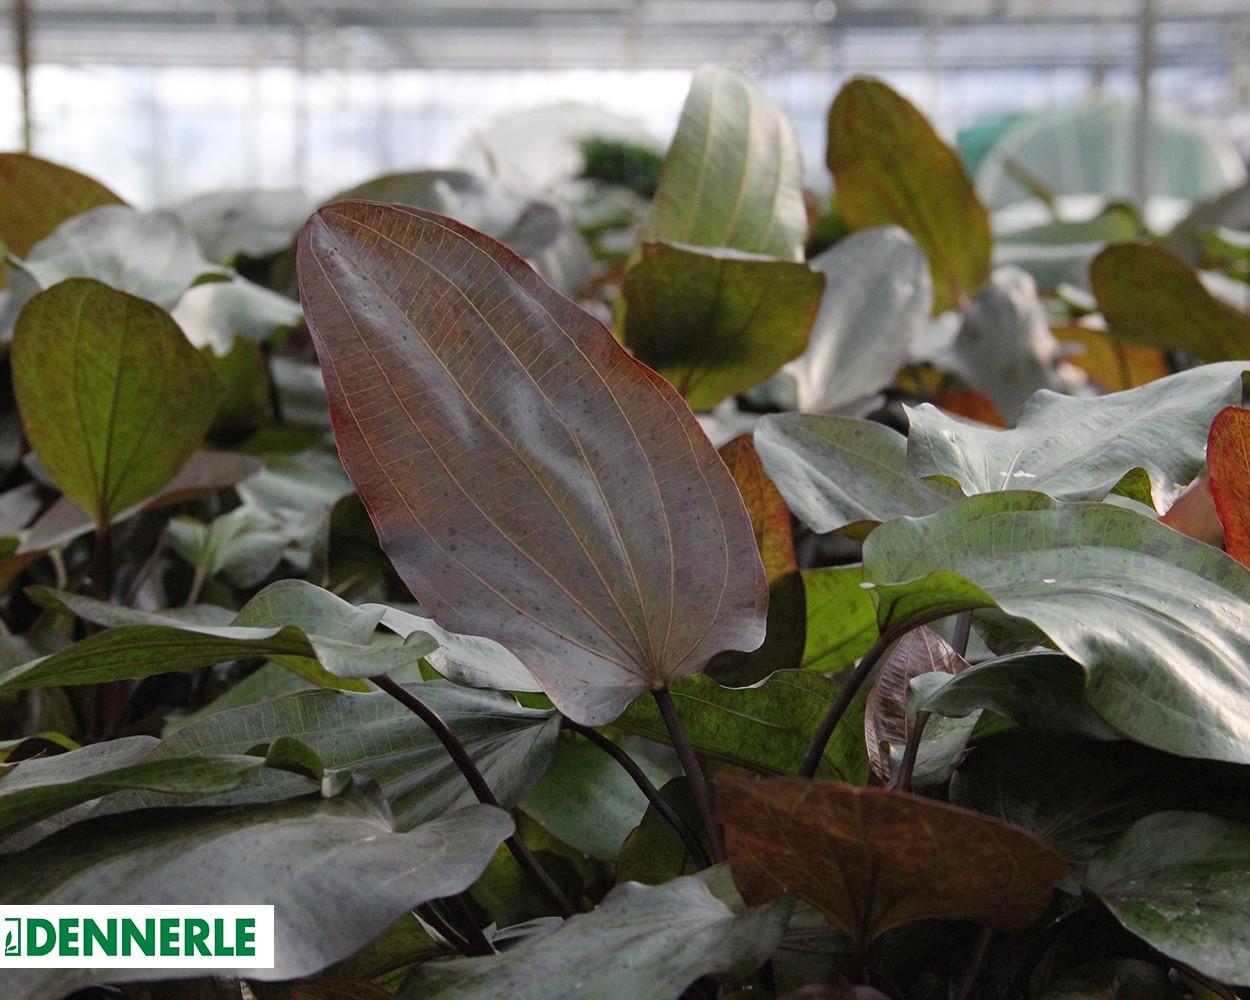 ozelot froschl ffel echinodorus ozelot dennerle topf hintergrundpflanze aquariumpflanzen. Black Bedroom Furniture Sets. Home Design Ideas